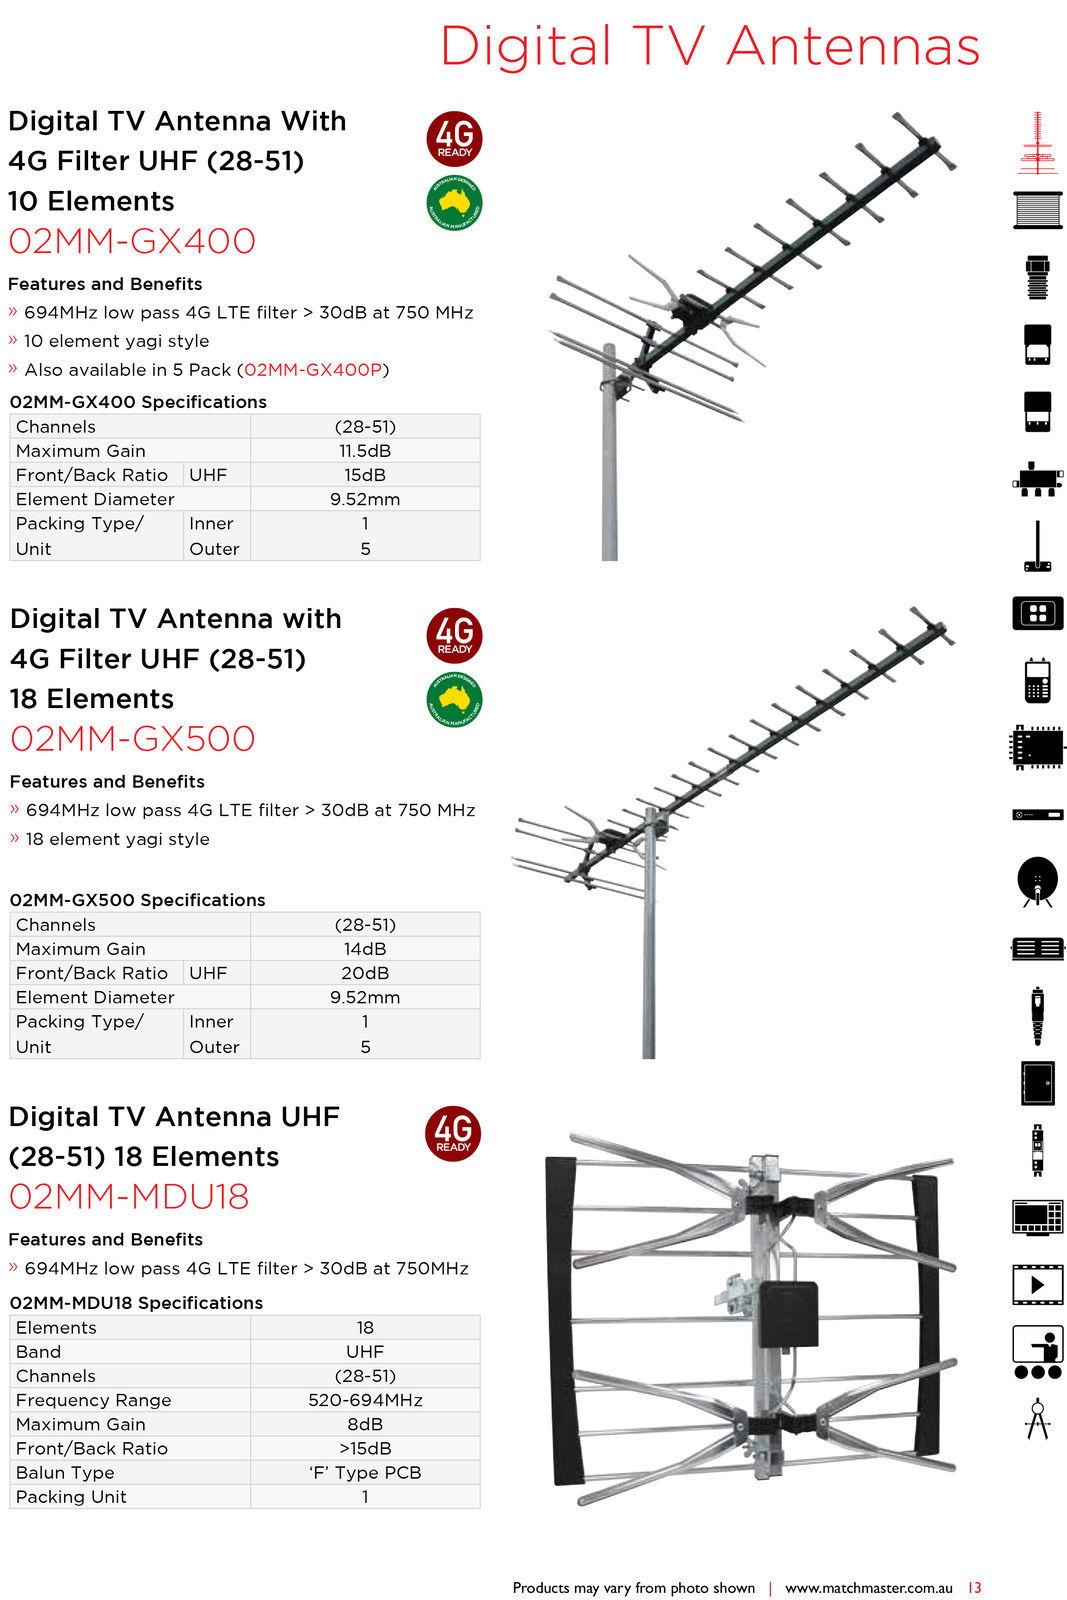 hight resolution of matchmaster phased array x type digital tv antenna uhf 36 elements 02mm mdu36 331823822096 7